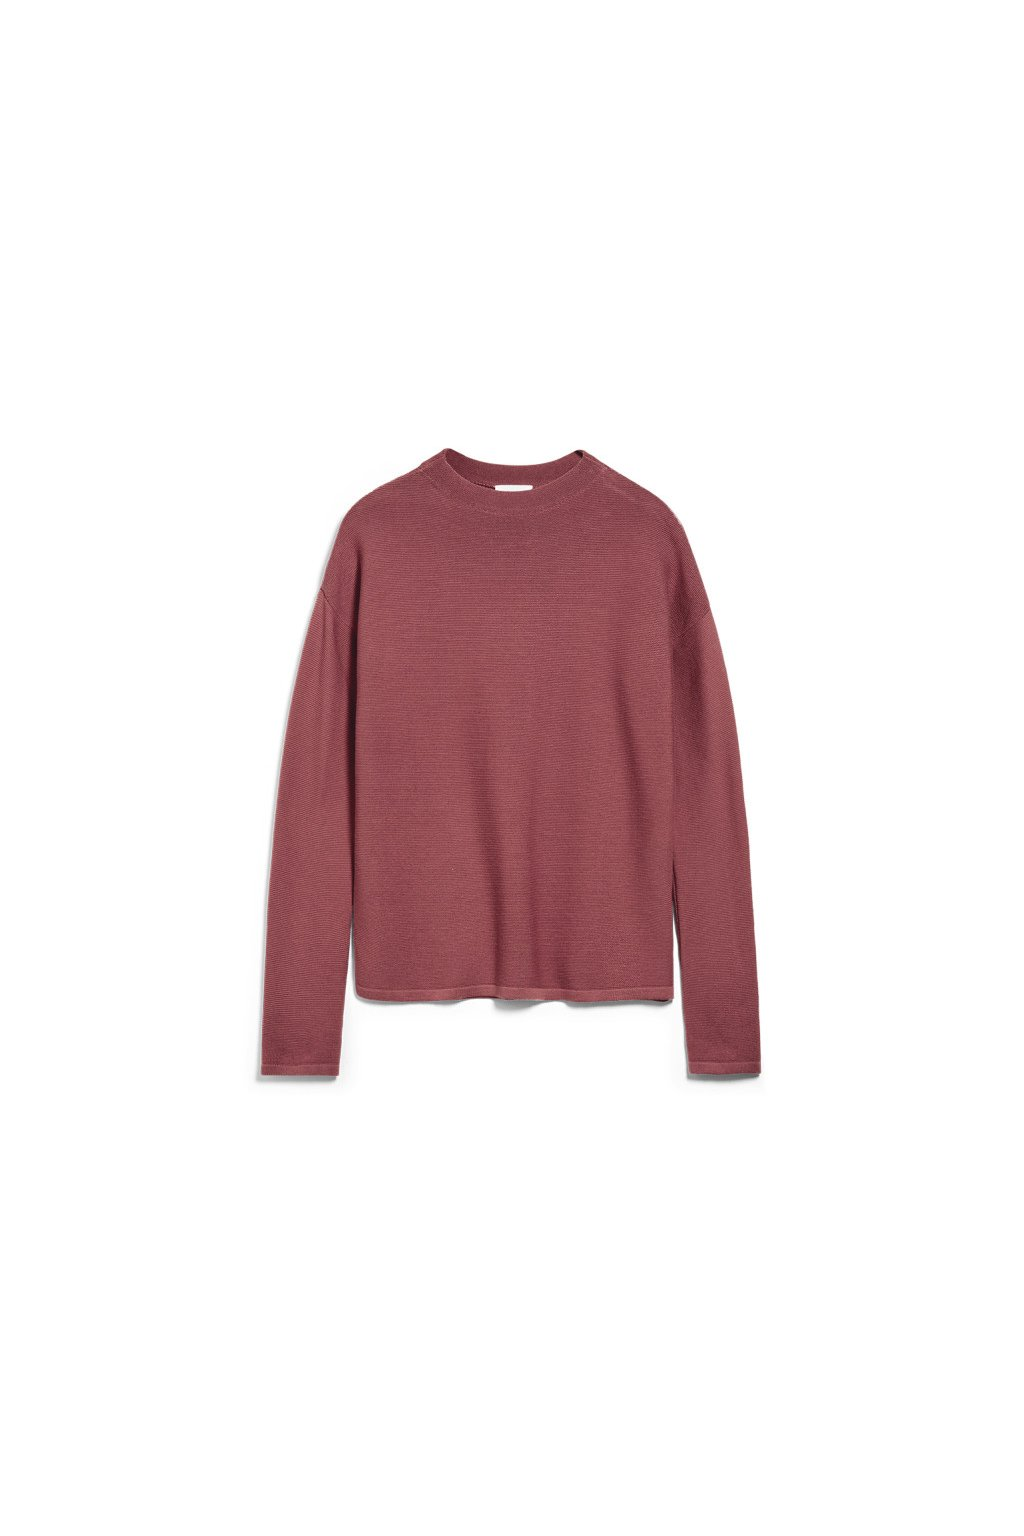 "Dámsky ružový sveter ""MEDINAA cinnamon rose"""